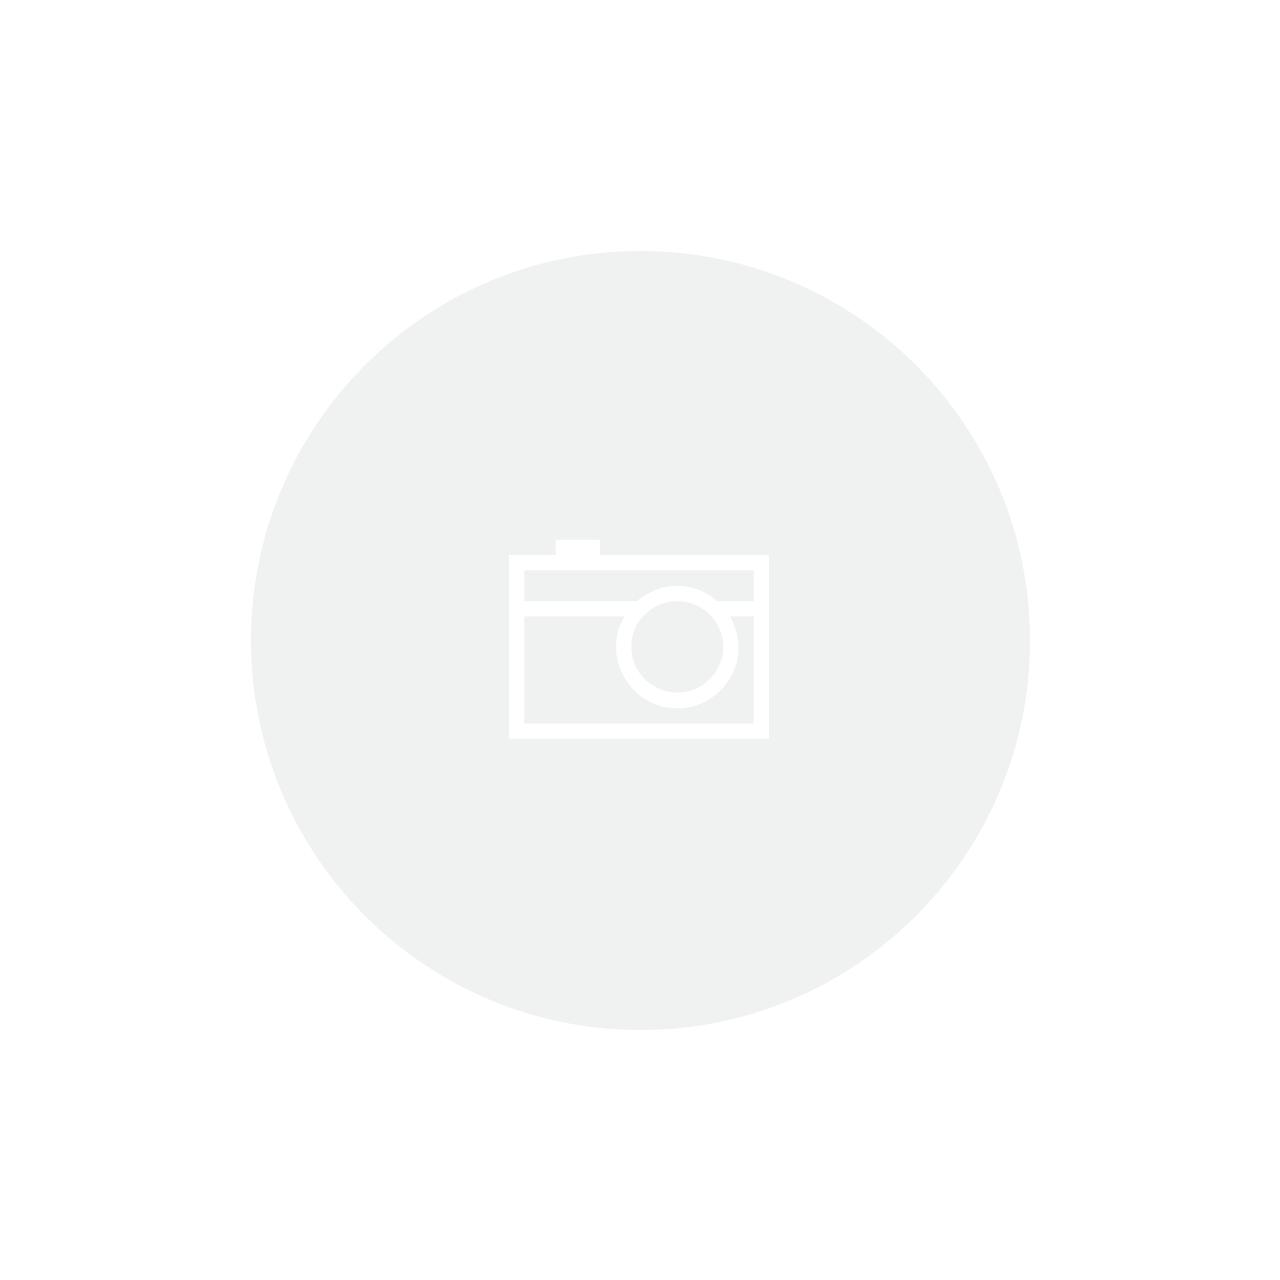 Toalha Pequena 44x24,5 cm